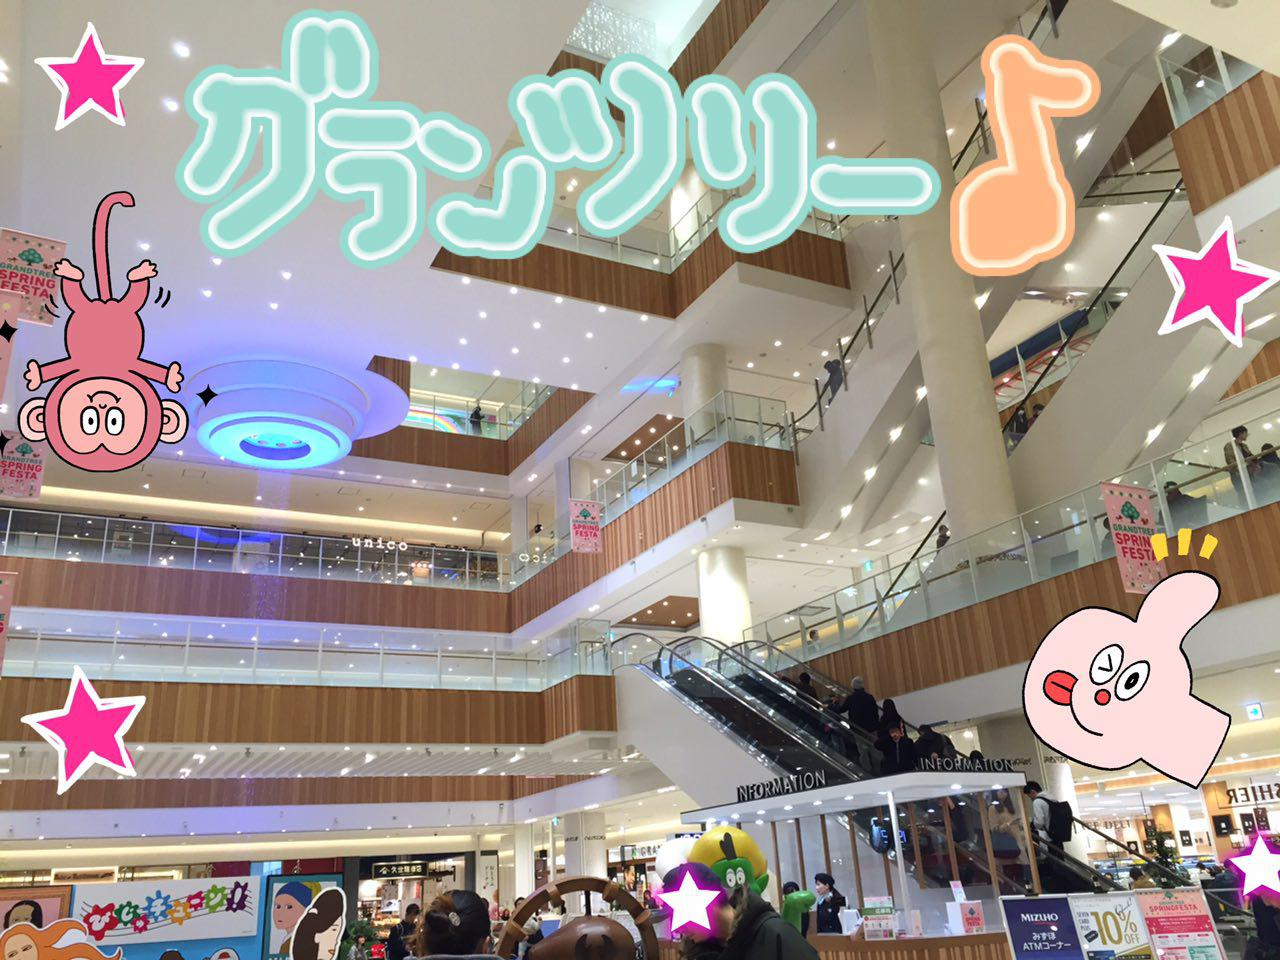 photo_2017-03-20_23-55-44.jpg